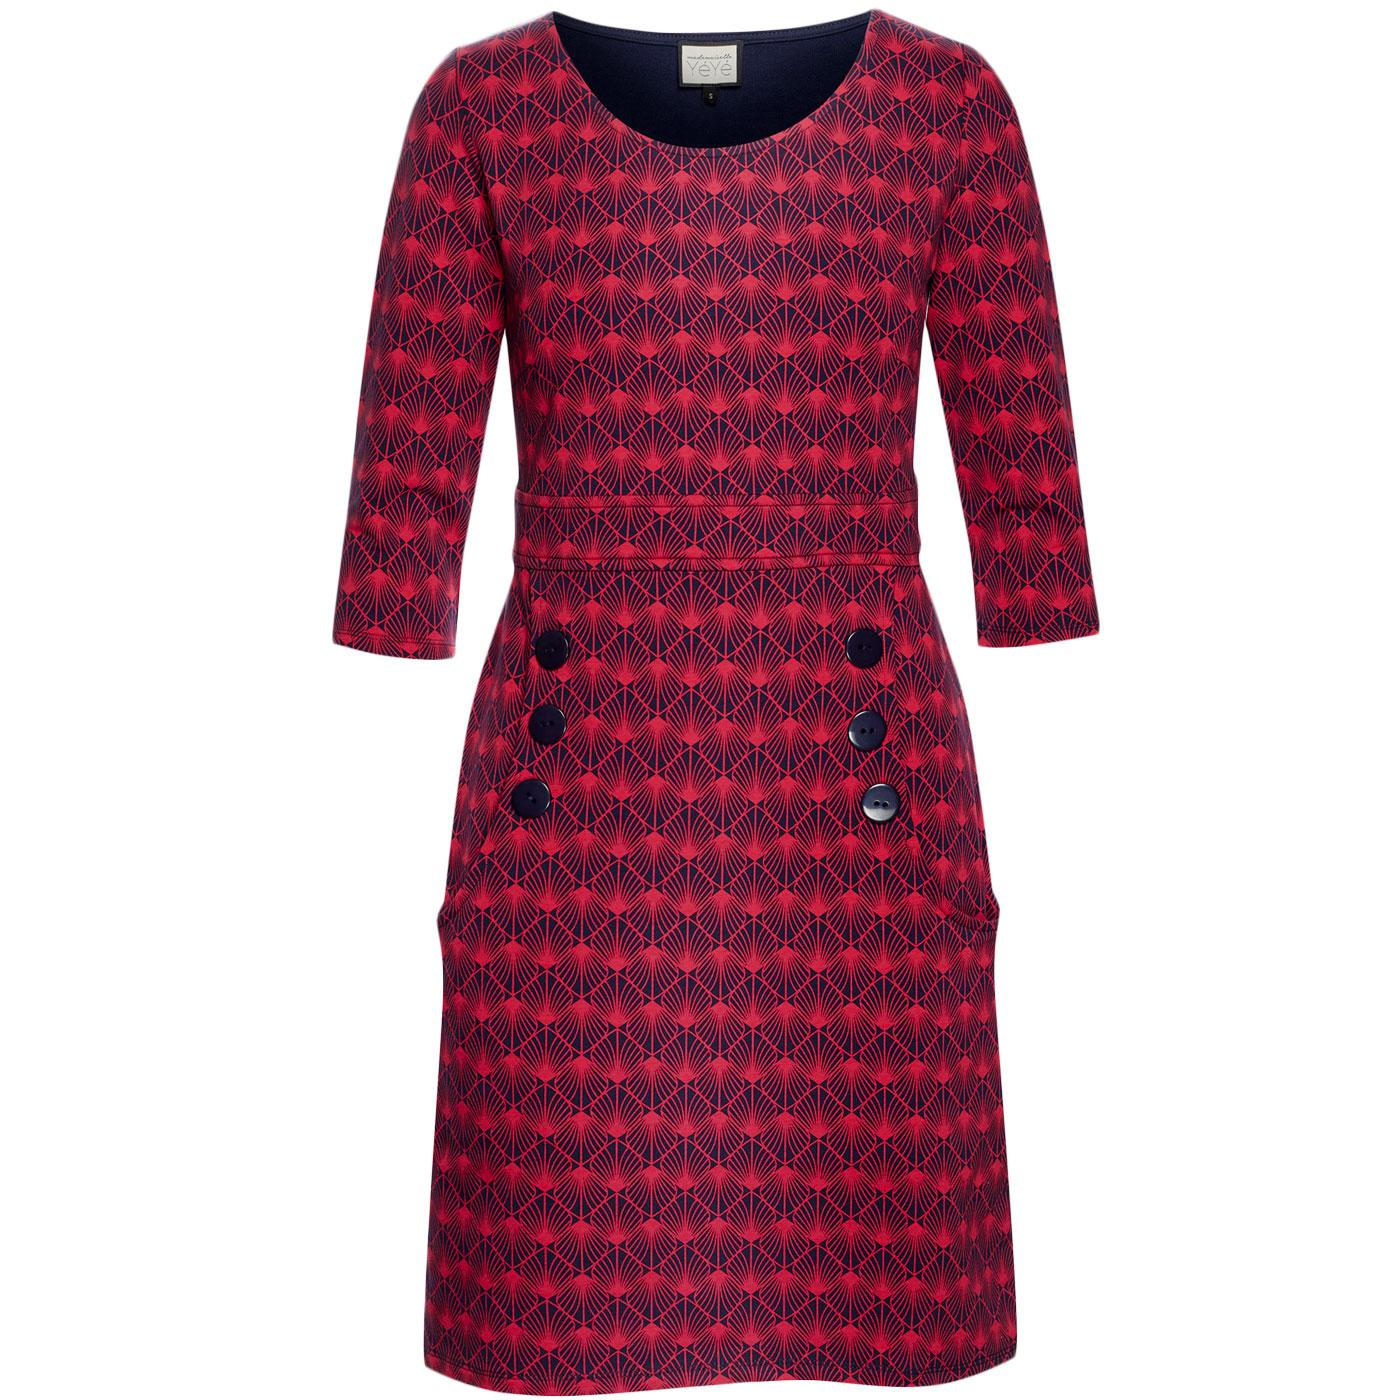 Oh my Lola MADEMOISELLE YEYE Printed 60s Dress RED